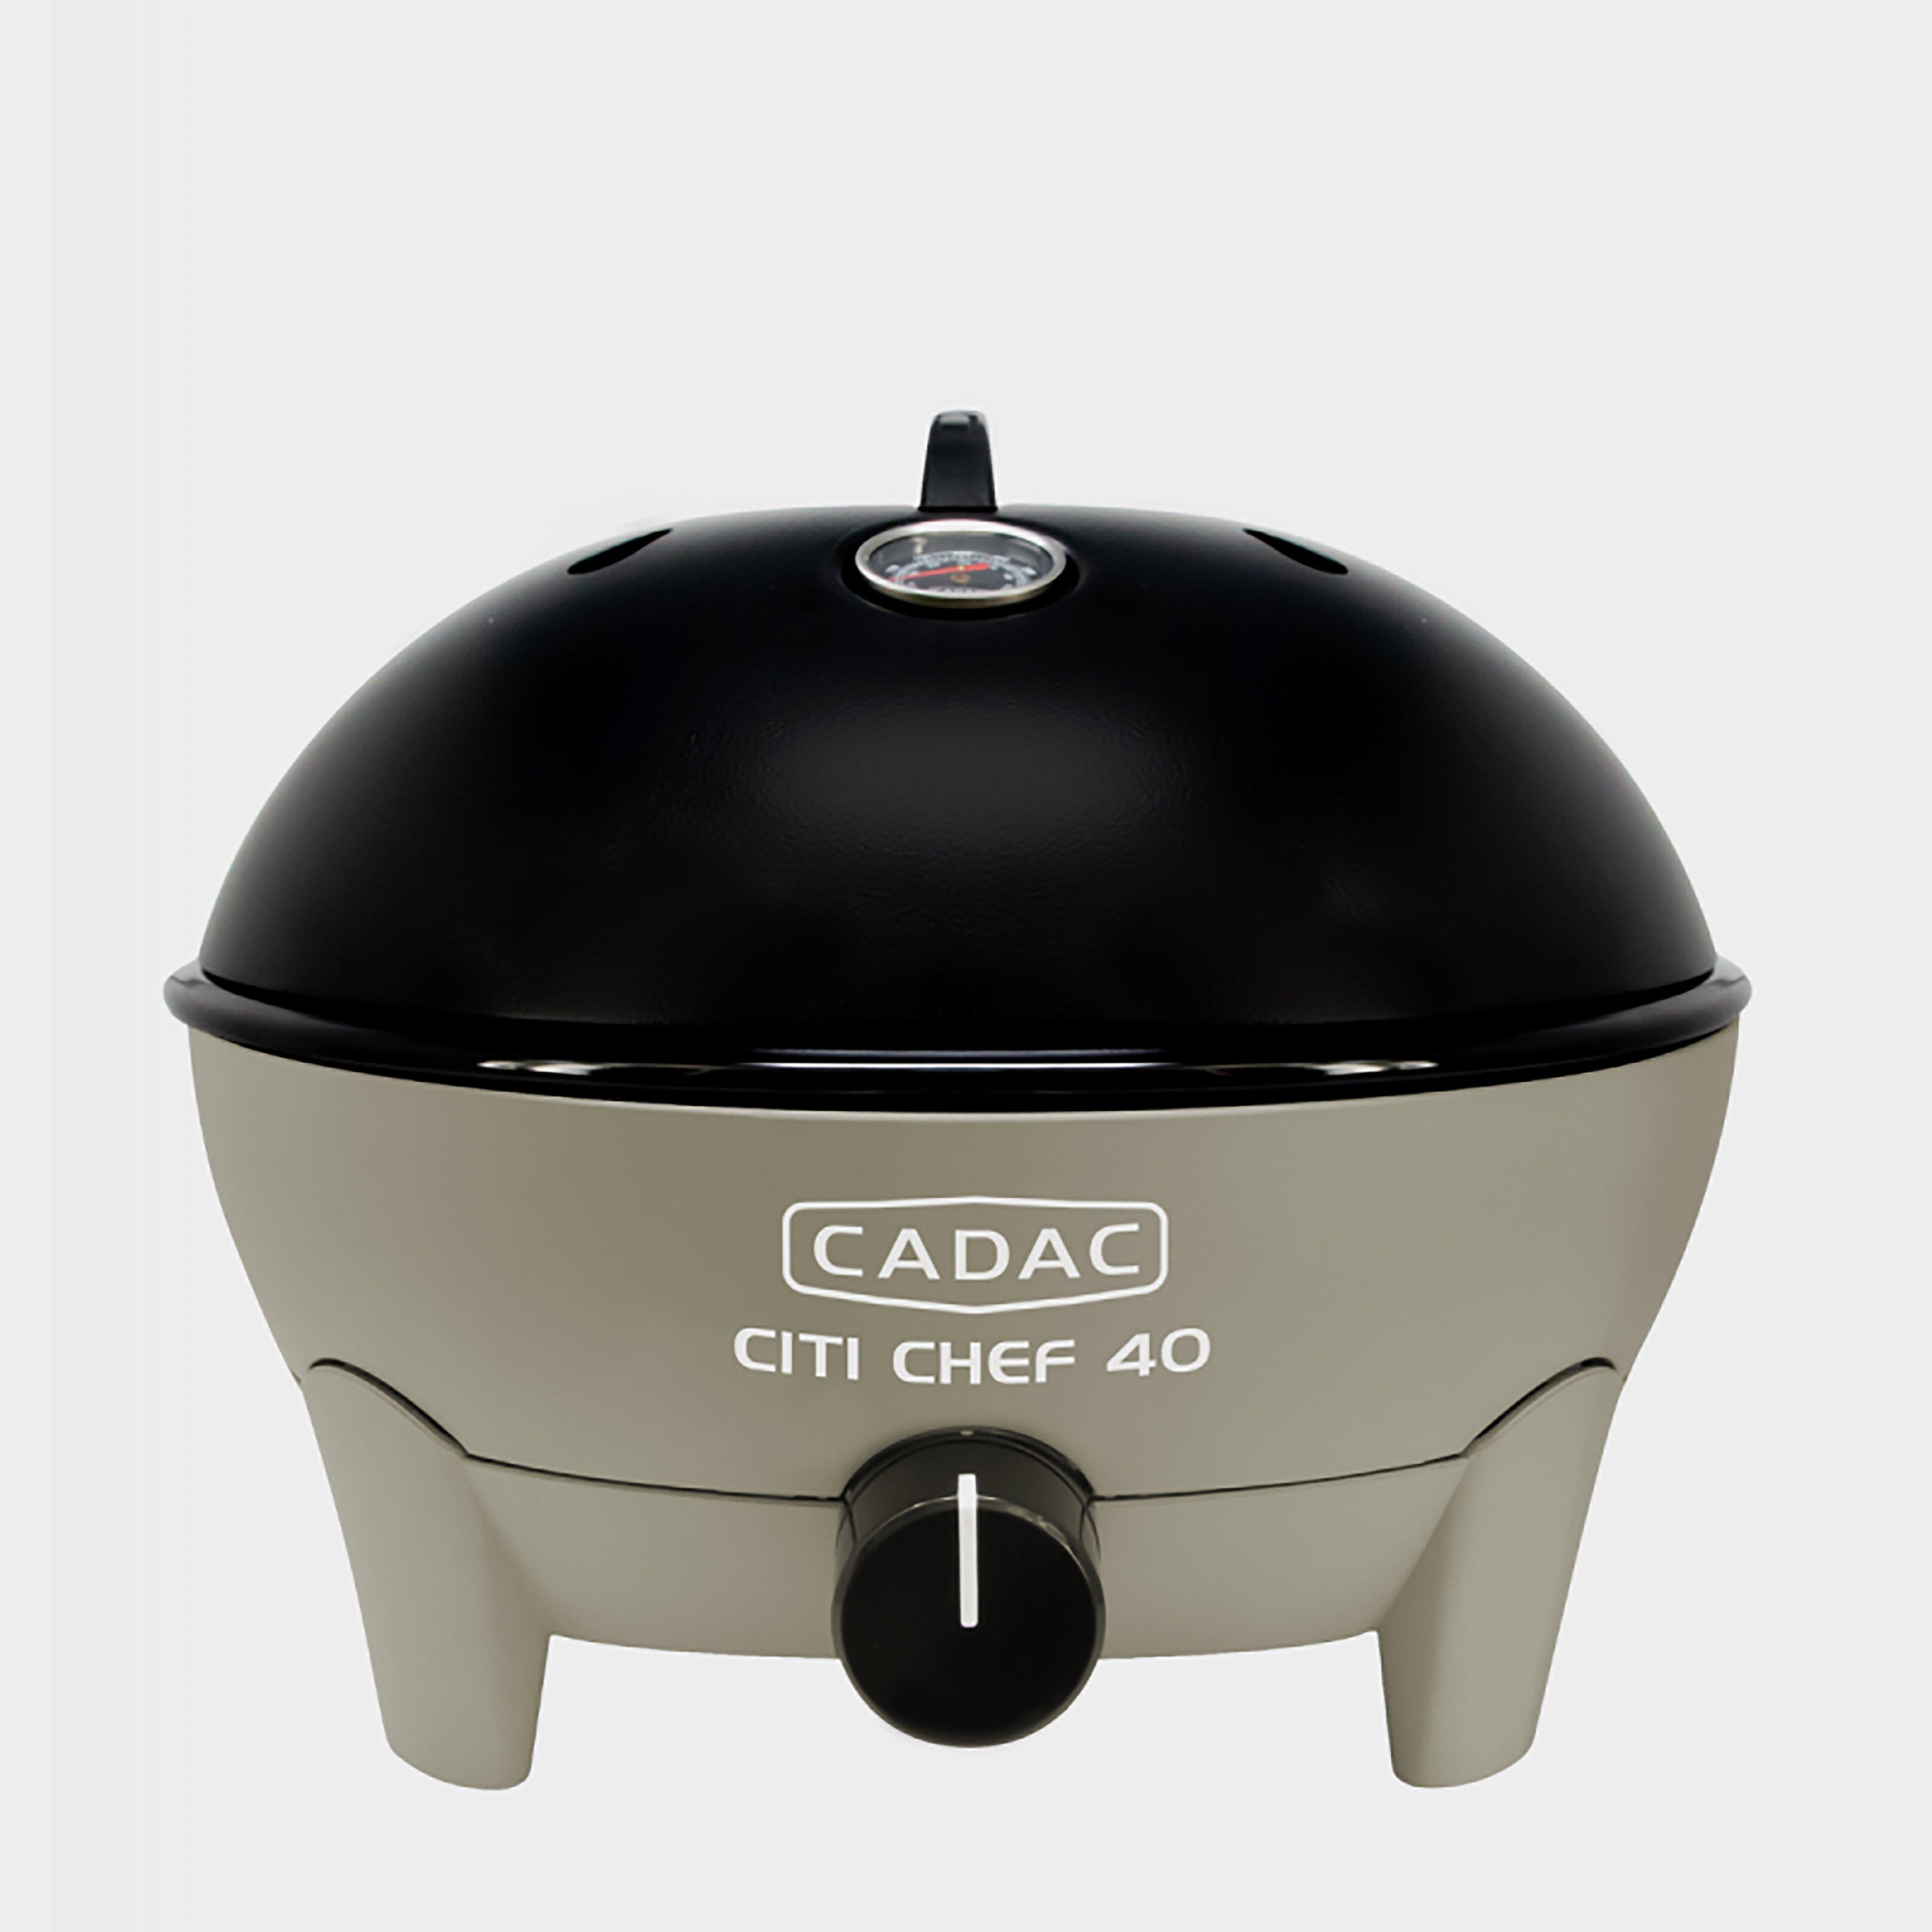 Cadac Citi Chef 40 Table Top Gas Bbq - Olv/Olv, Green